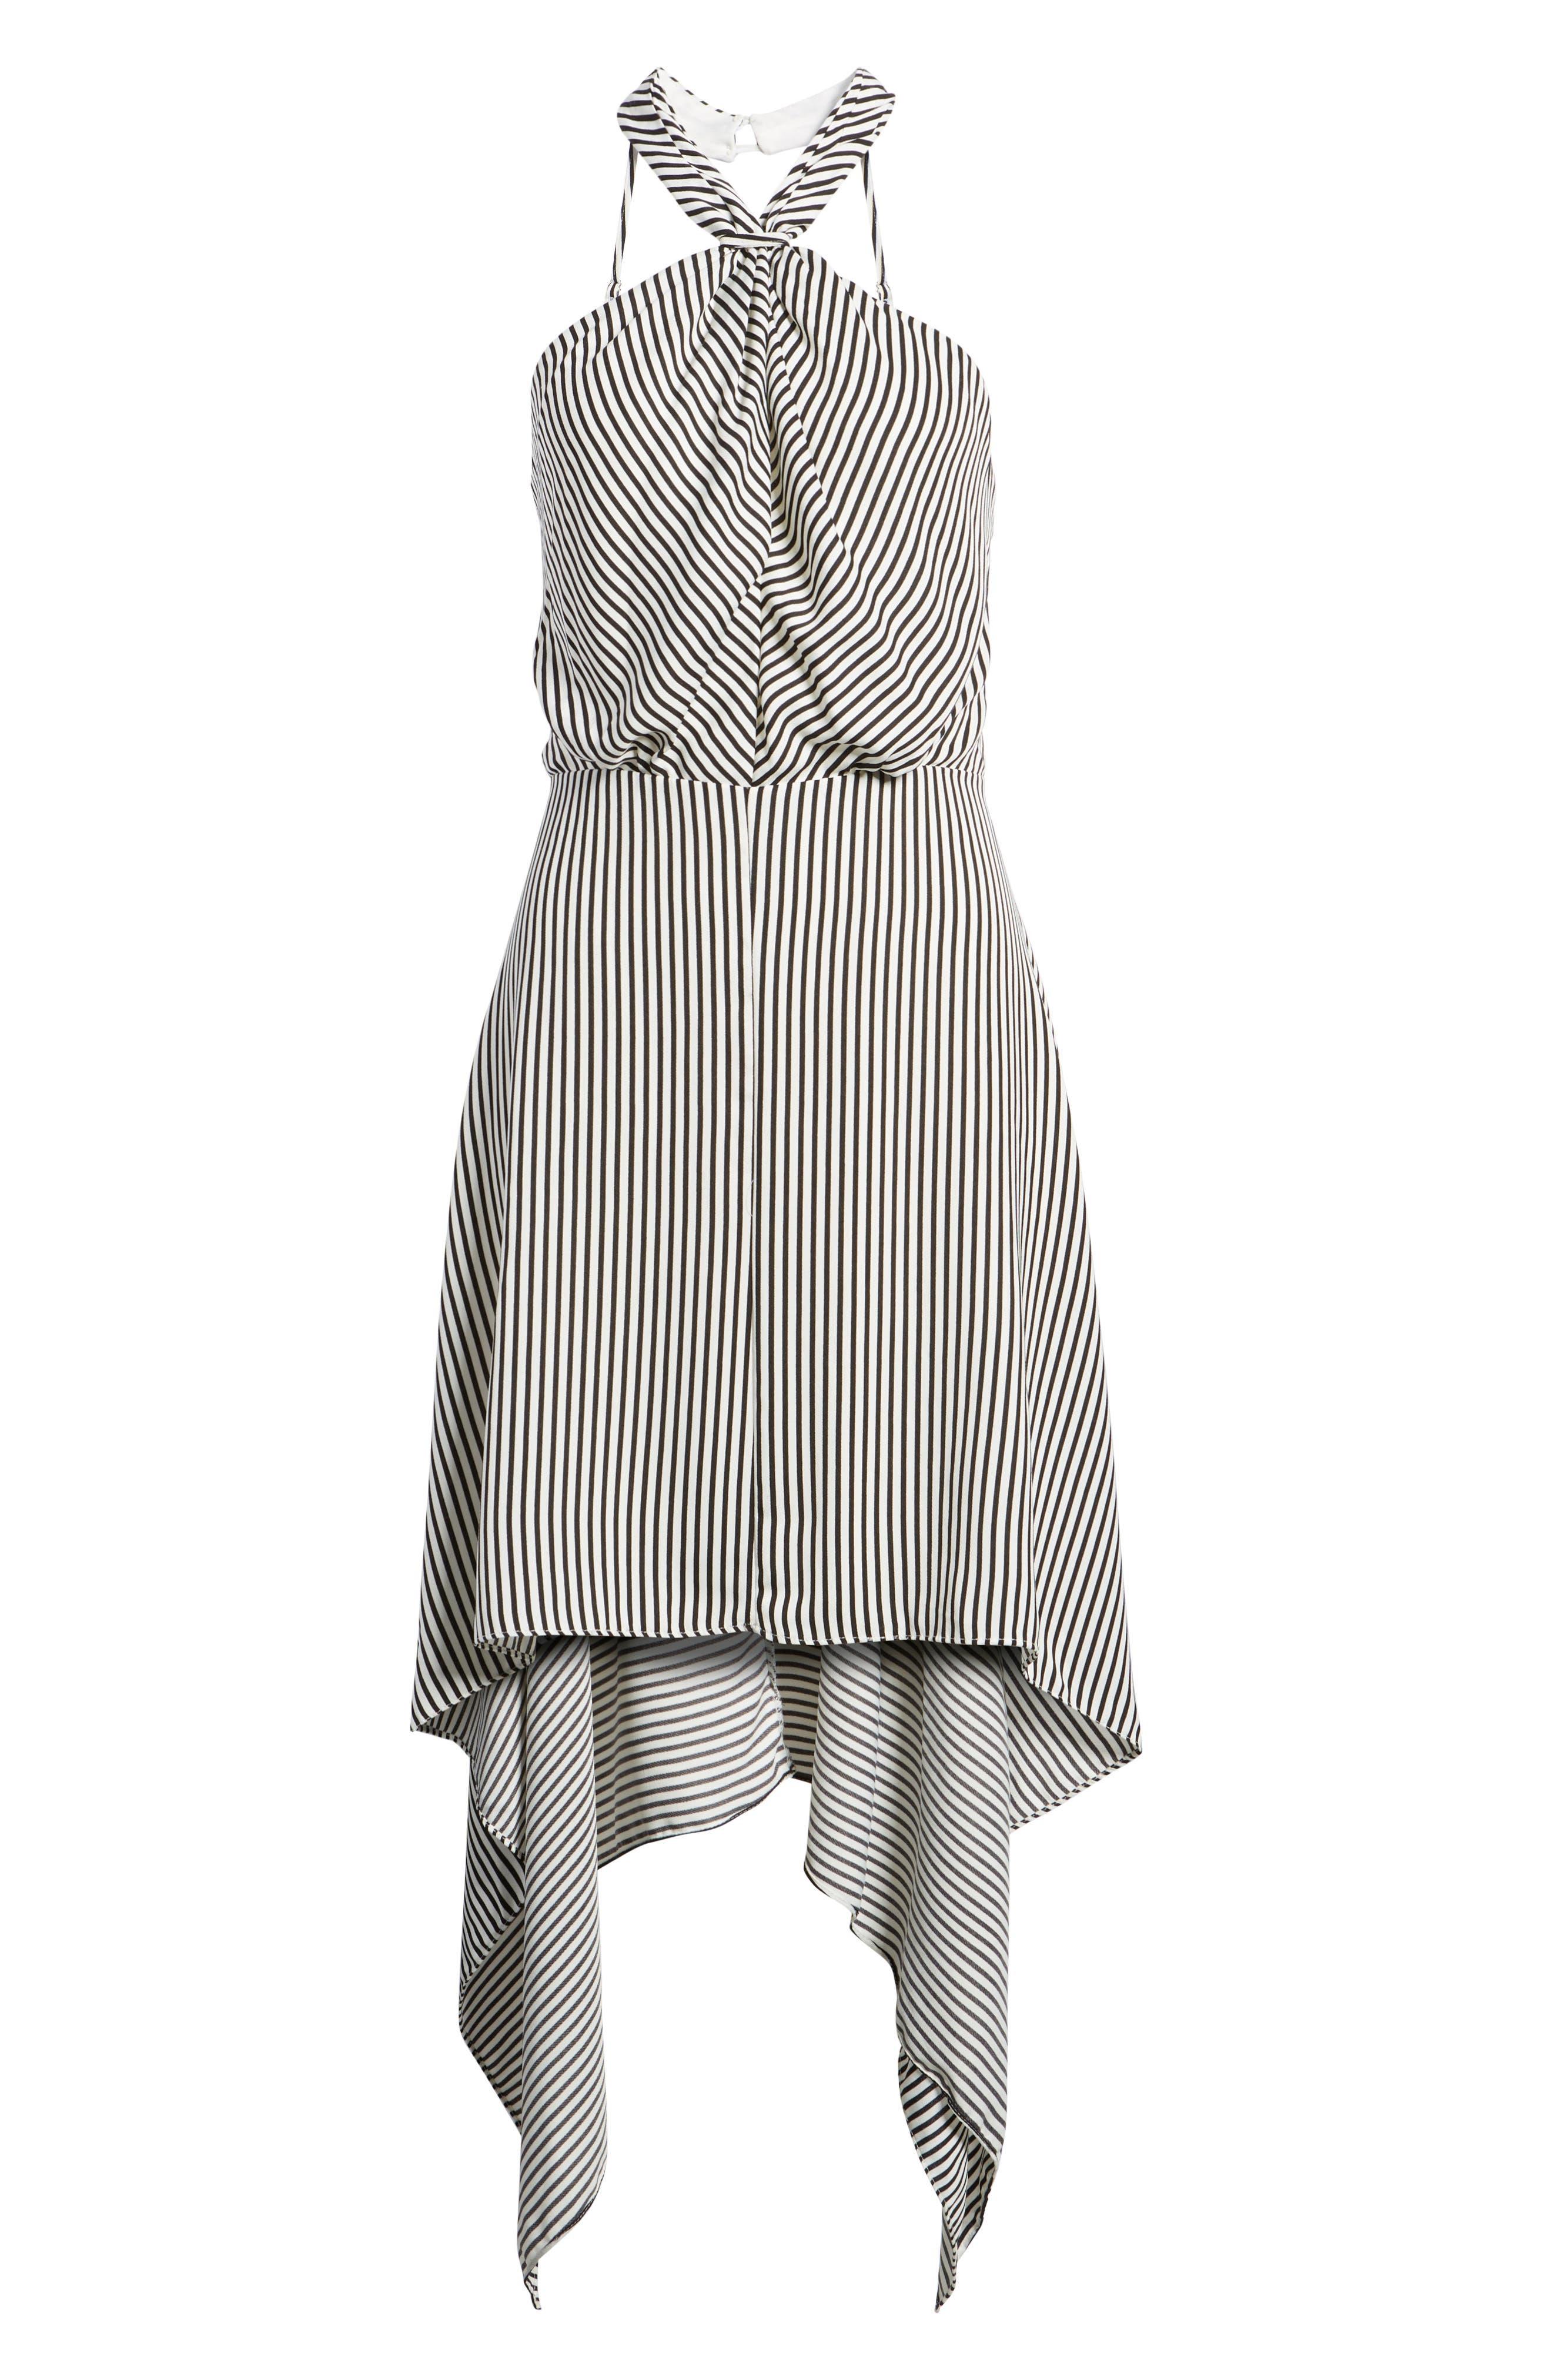 Bishop + Young Ana Stripe Shark Bite Hem Halter Dress,                             Alternate thumbnail 7, color,                             Black Stripe